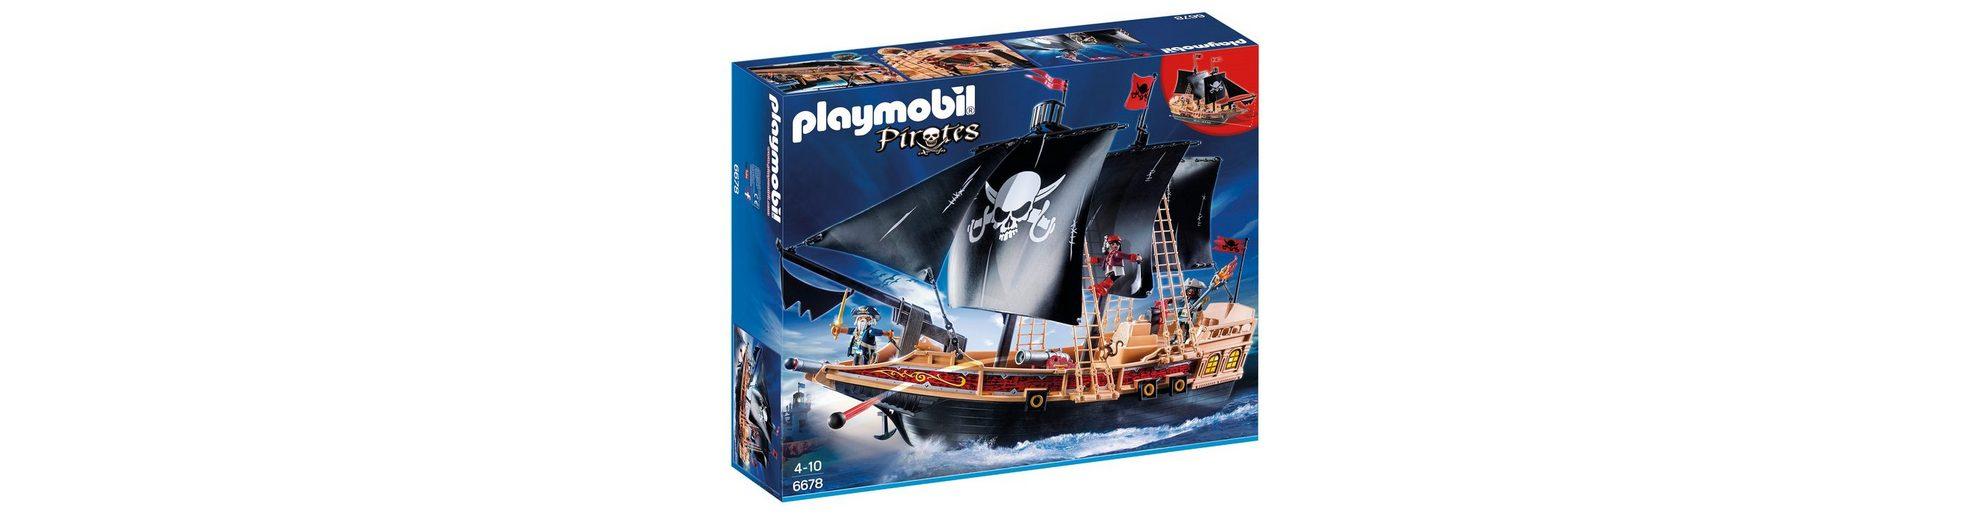 Playmobil® Piraten-Kampfschiff (6678), Pirates